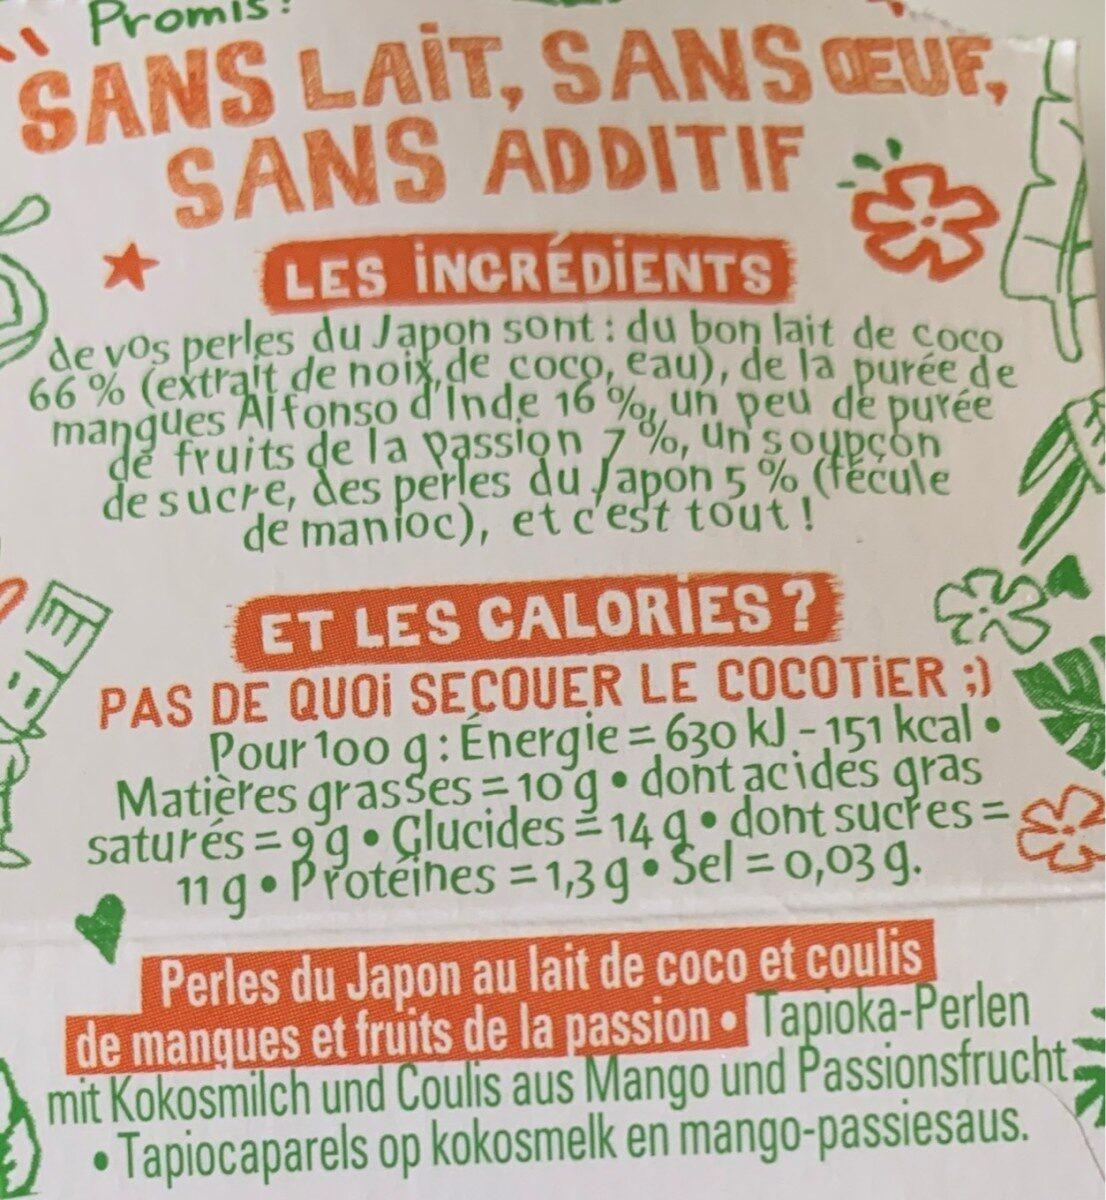 Perles Japon coco mangue passion 90g - Nutrition facts - fr